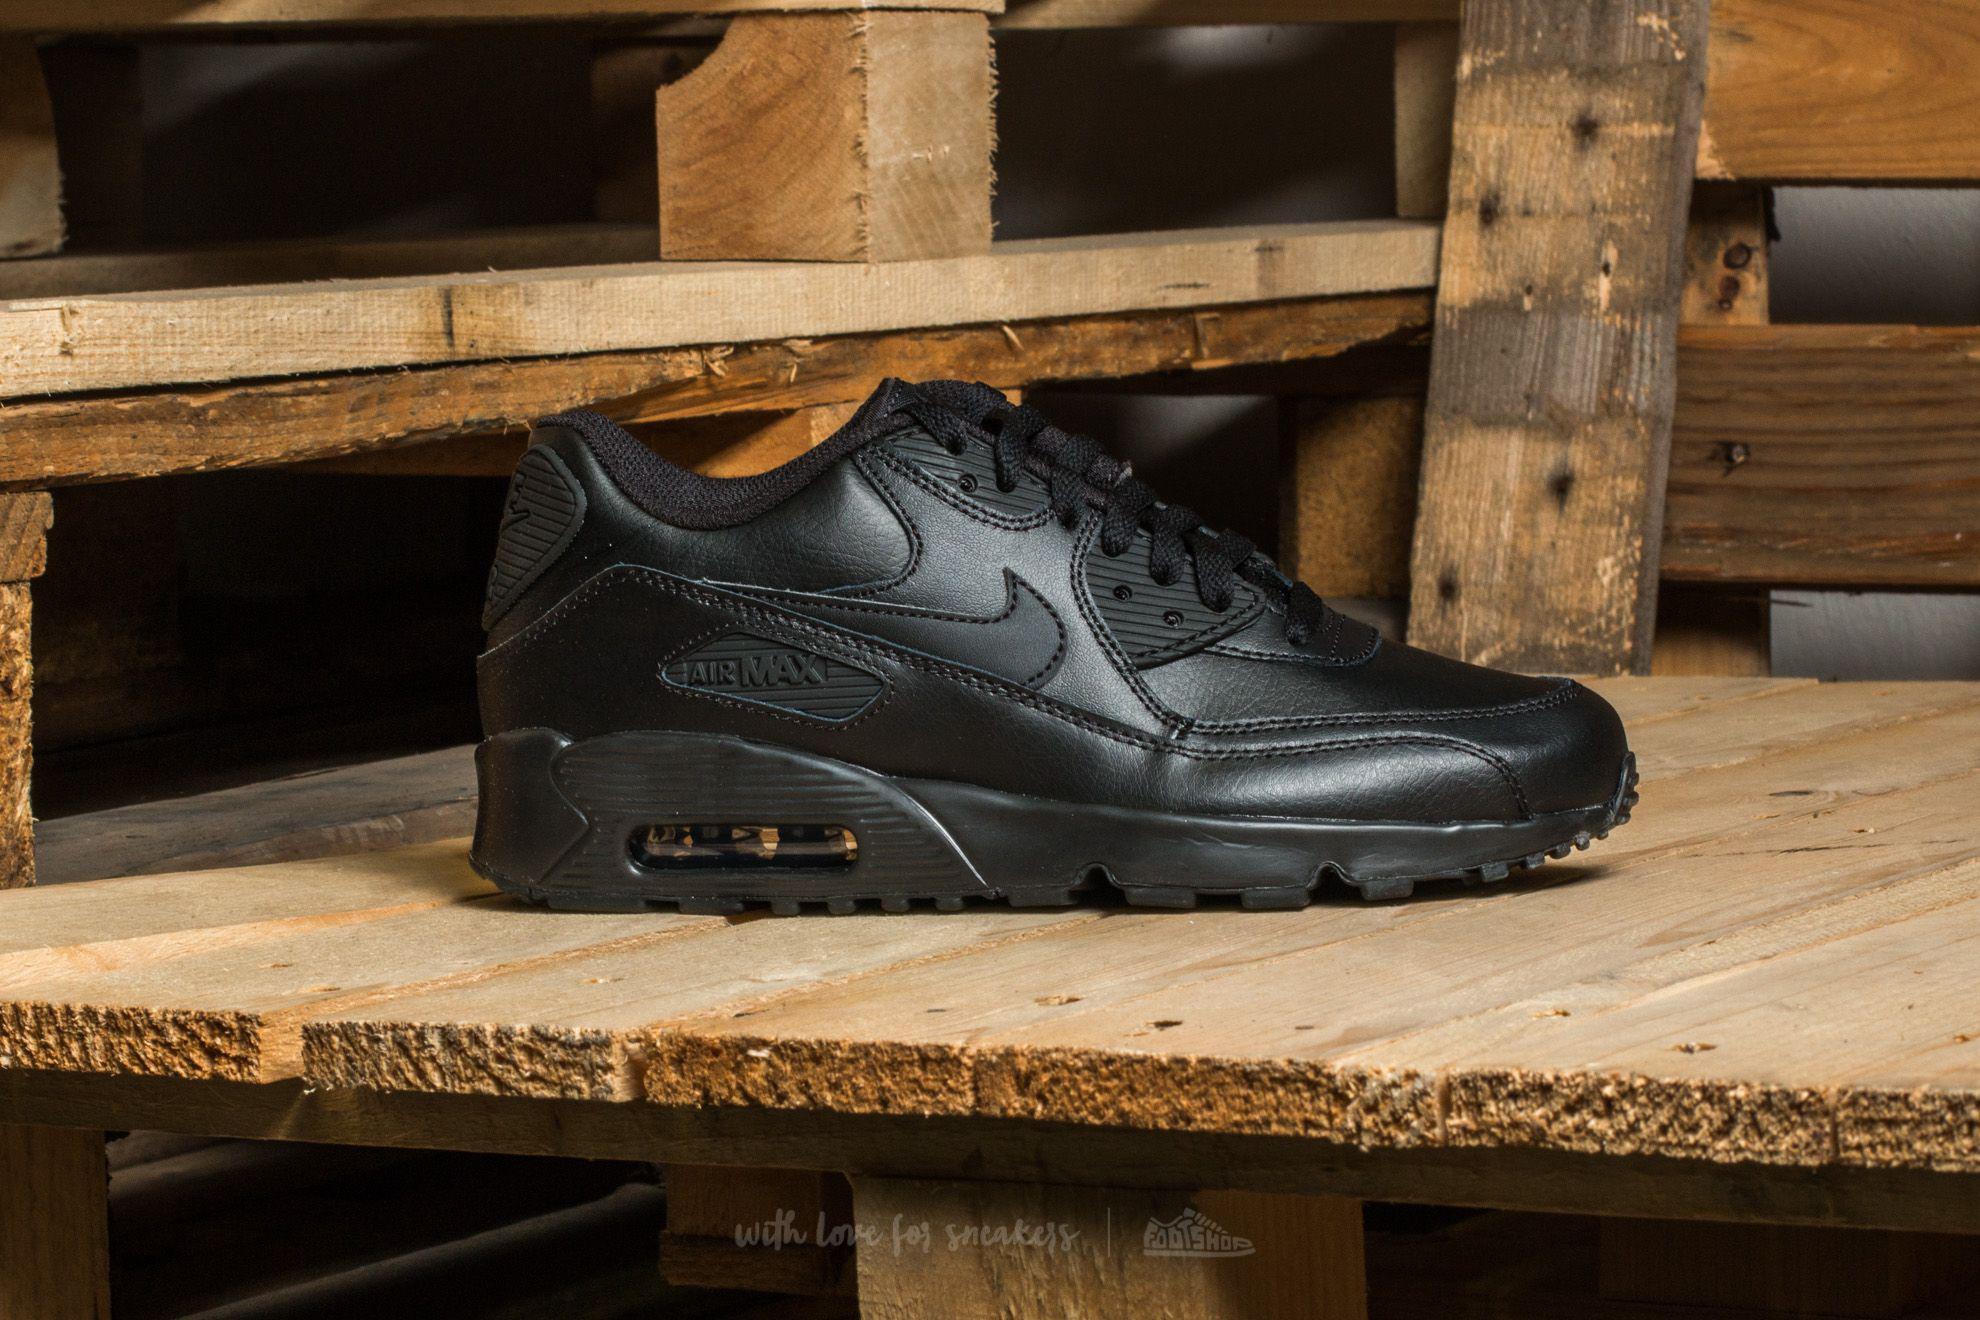 Lyst - Nike Air Max 90 Leather (gs) Black-black in Black 018e6ca29e